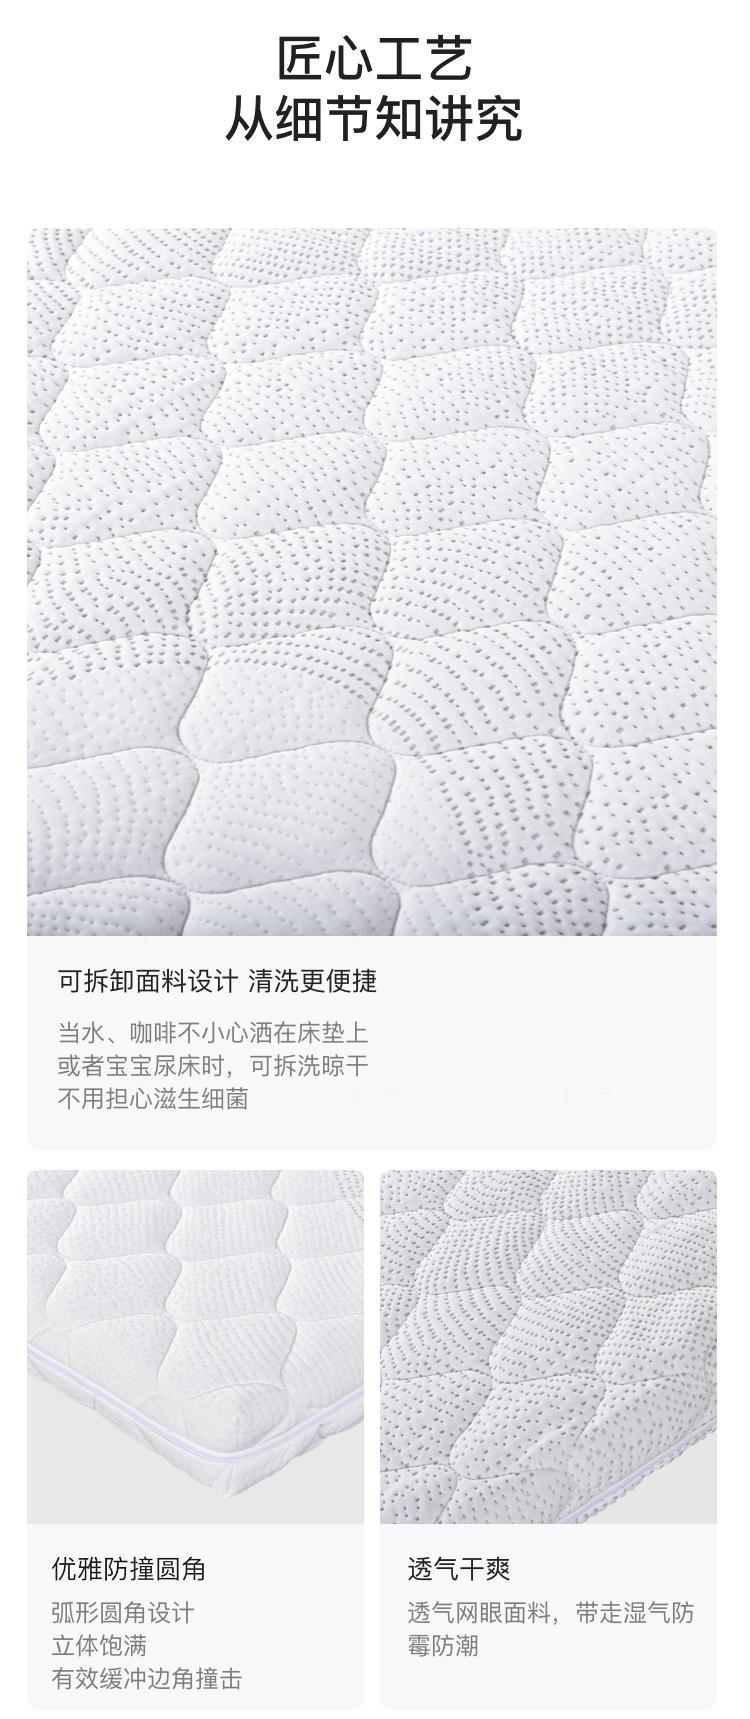 VELDA系列摩尔乳胶床垫的详细介绍